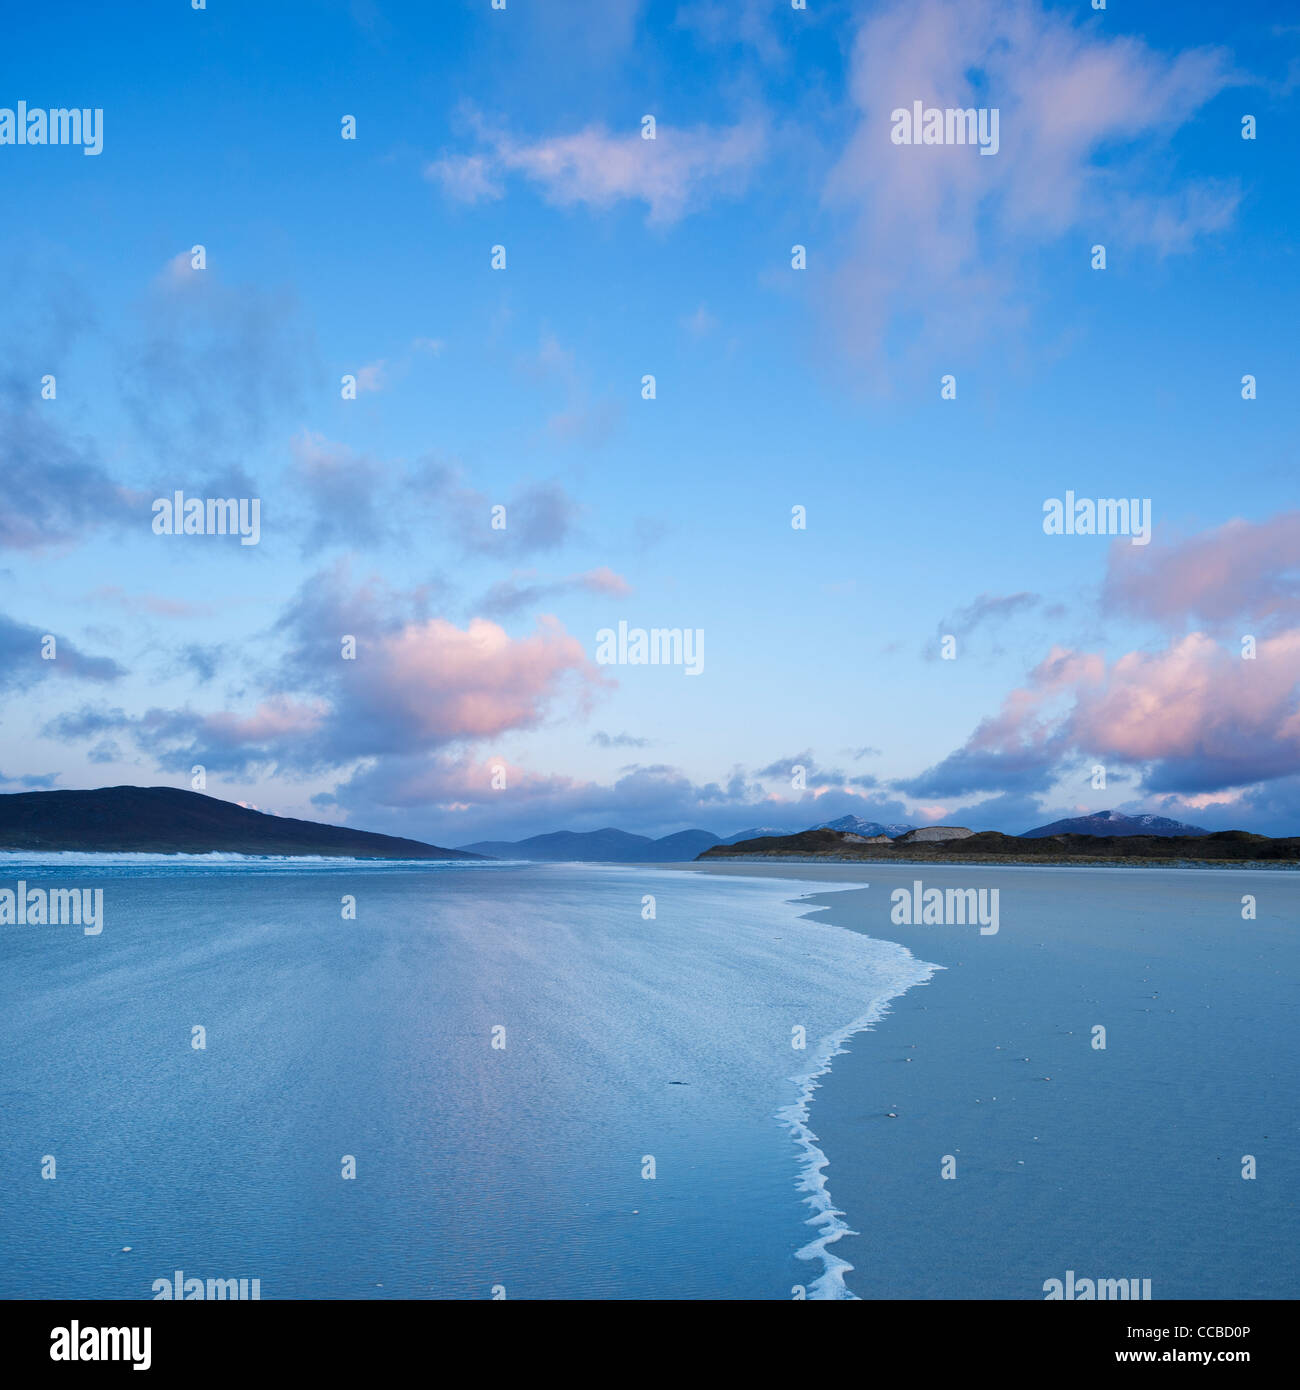 Luskentyre beach at dawn, Isle of Harris, Outer Hebrides, Scotland - Stock Image